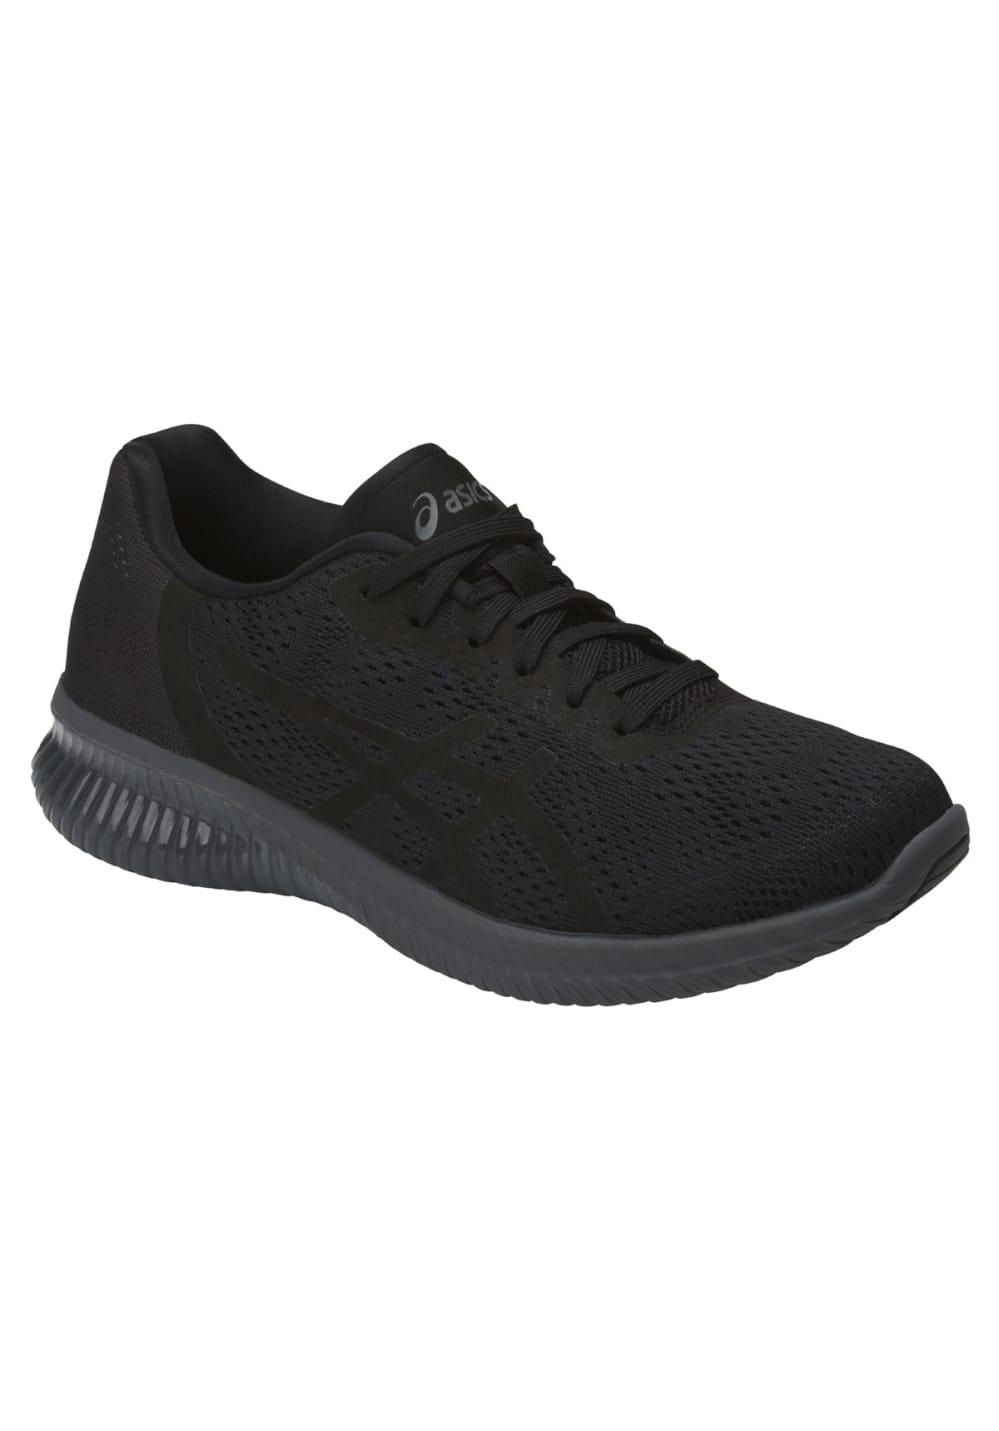 ASICS GEL Kenun MX GS Zapatillas de running Negro